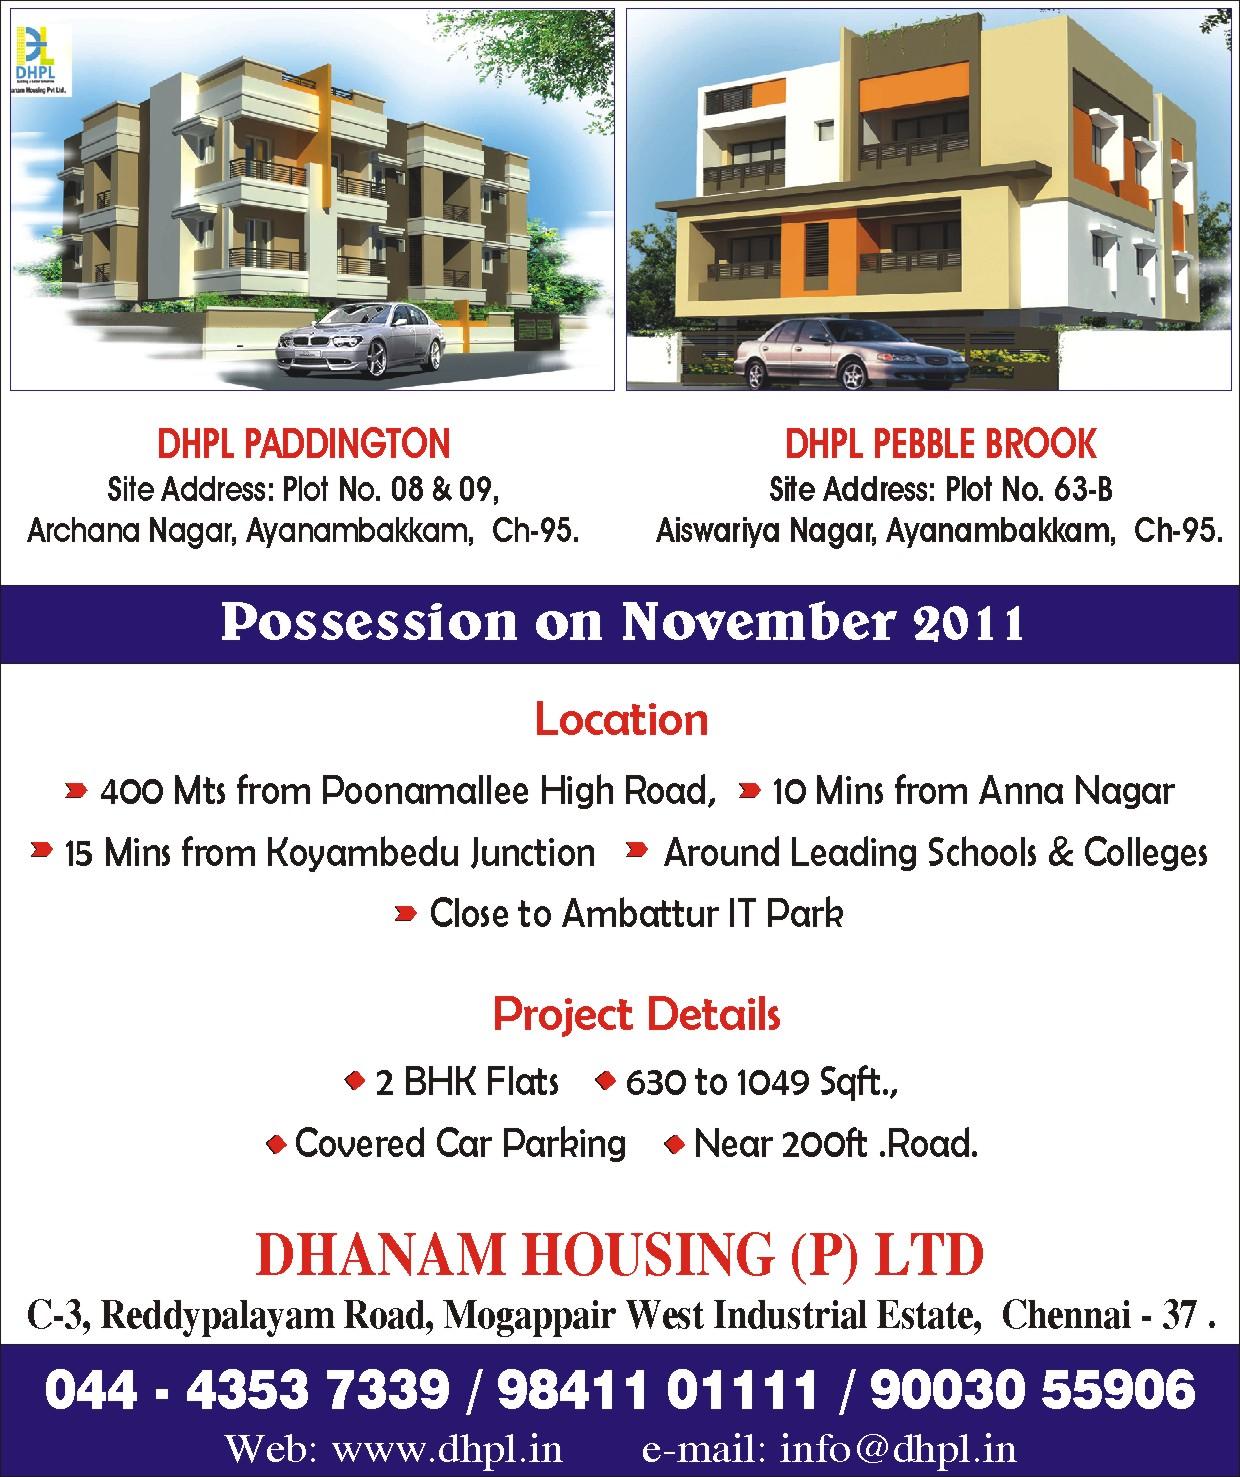 Dhanam Housing, Company, Chennai